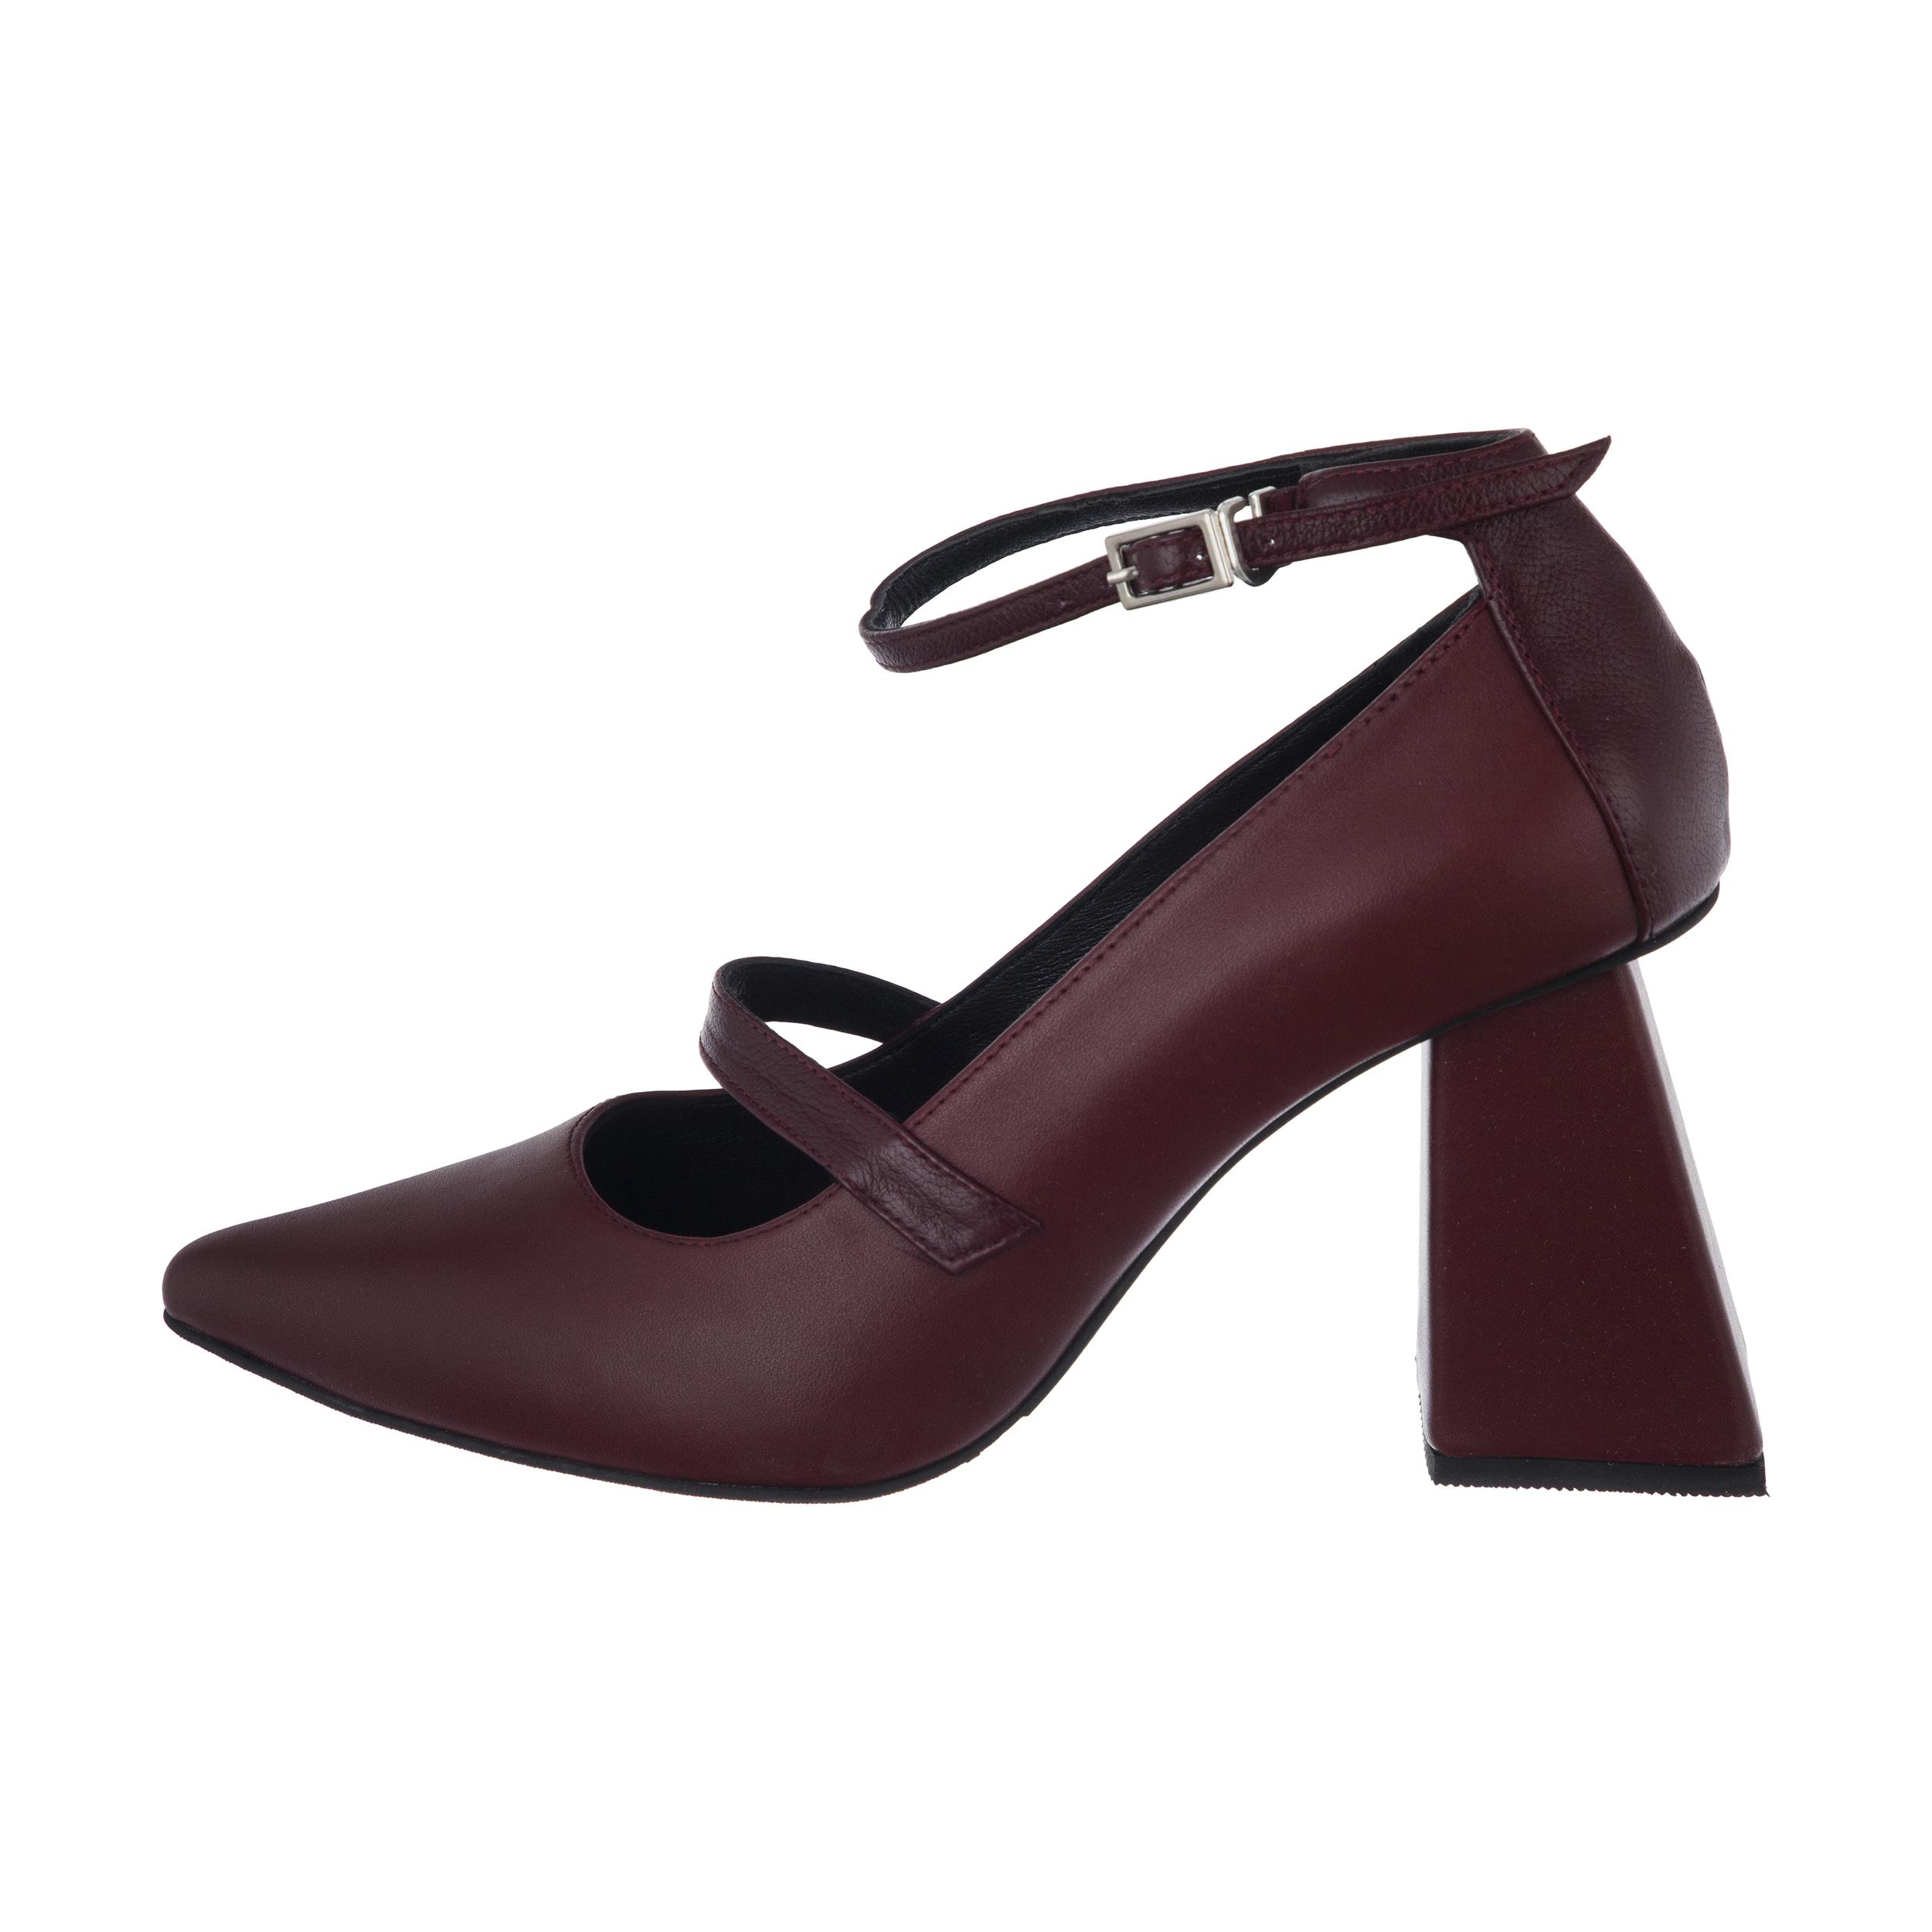 کفش زنانه آرتمن مدل Merry-41176 -  - 2